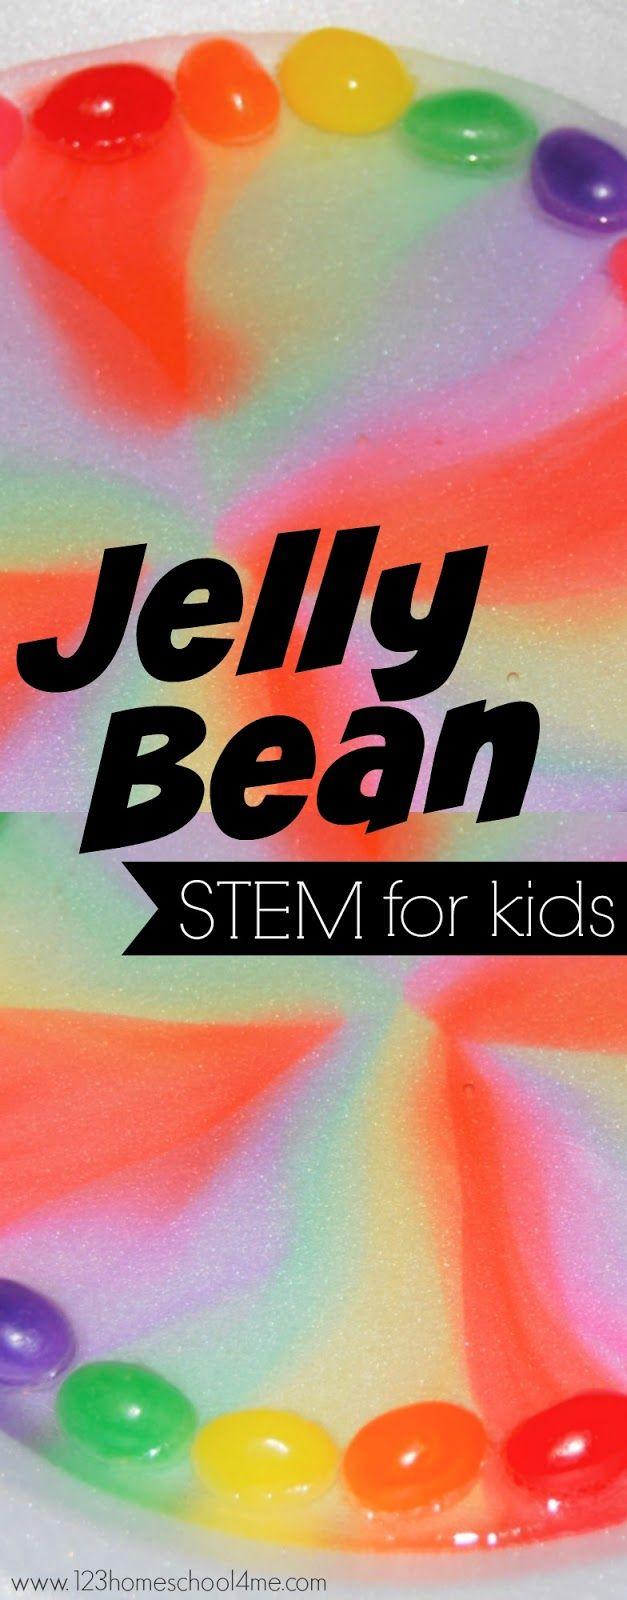 Jelly Bean STEM for Kids - such a fun science project for spring or Easter activities for kids toddler, preschool, prek, kindergarten, first grade, 2nd grade, homeschool